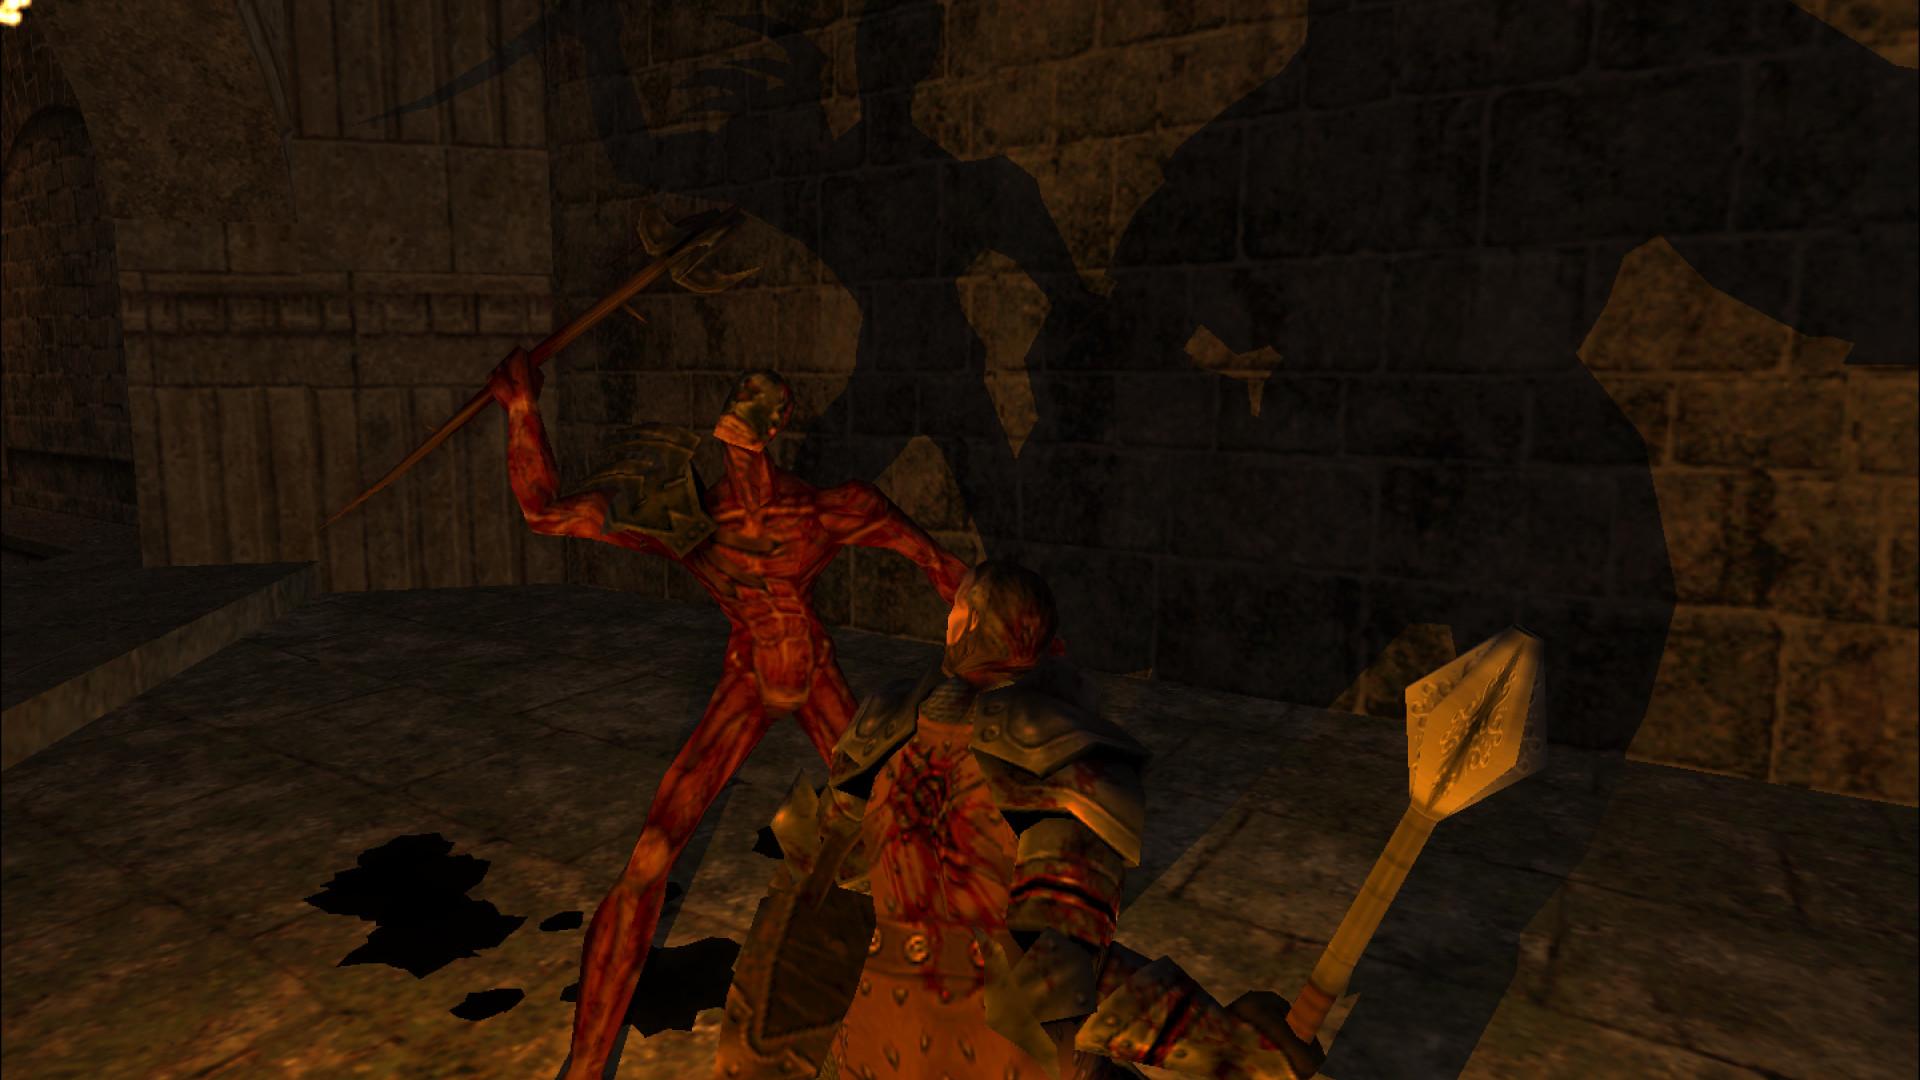 Blade of Darkness screenshot 1